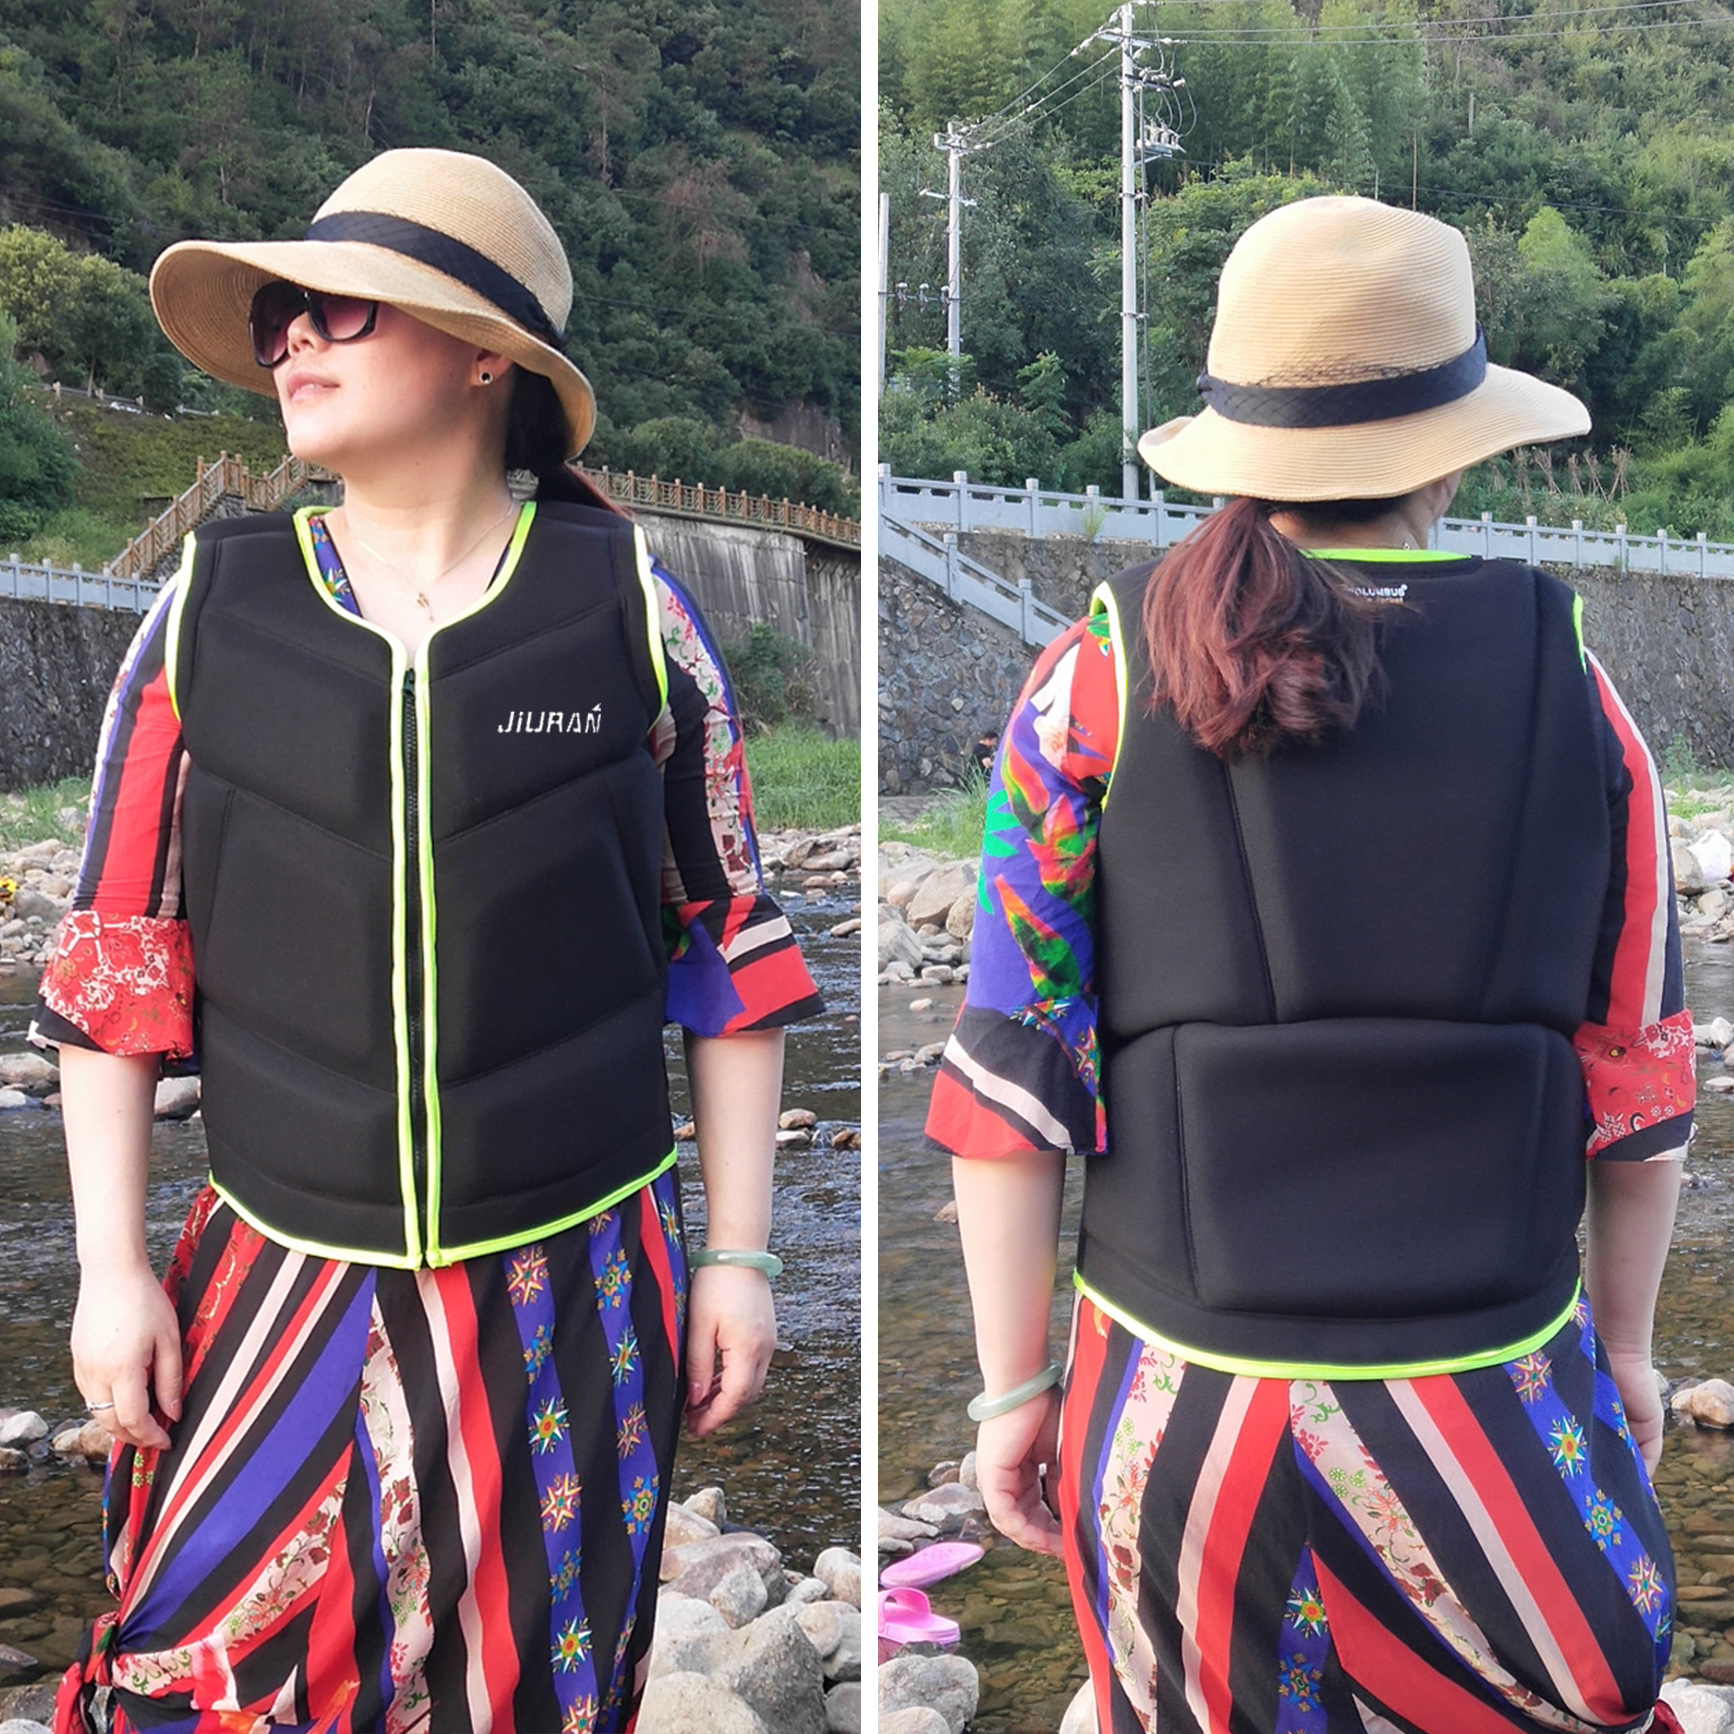 Fishing Vest Outdoor Water Sports Life Jacket Adult Kids Life Vest Jacket Swimming Boating Ski Drifting Life Vest For Man/Women